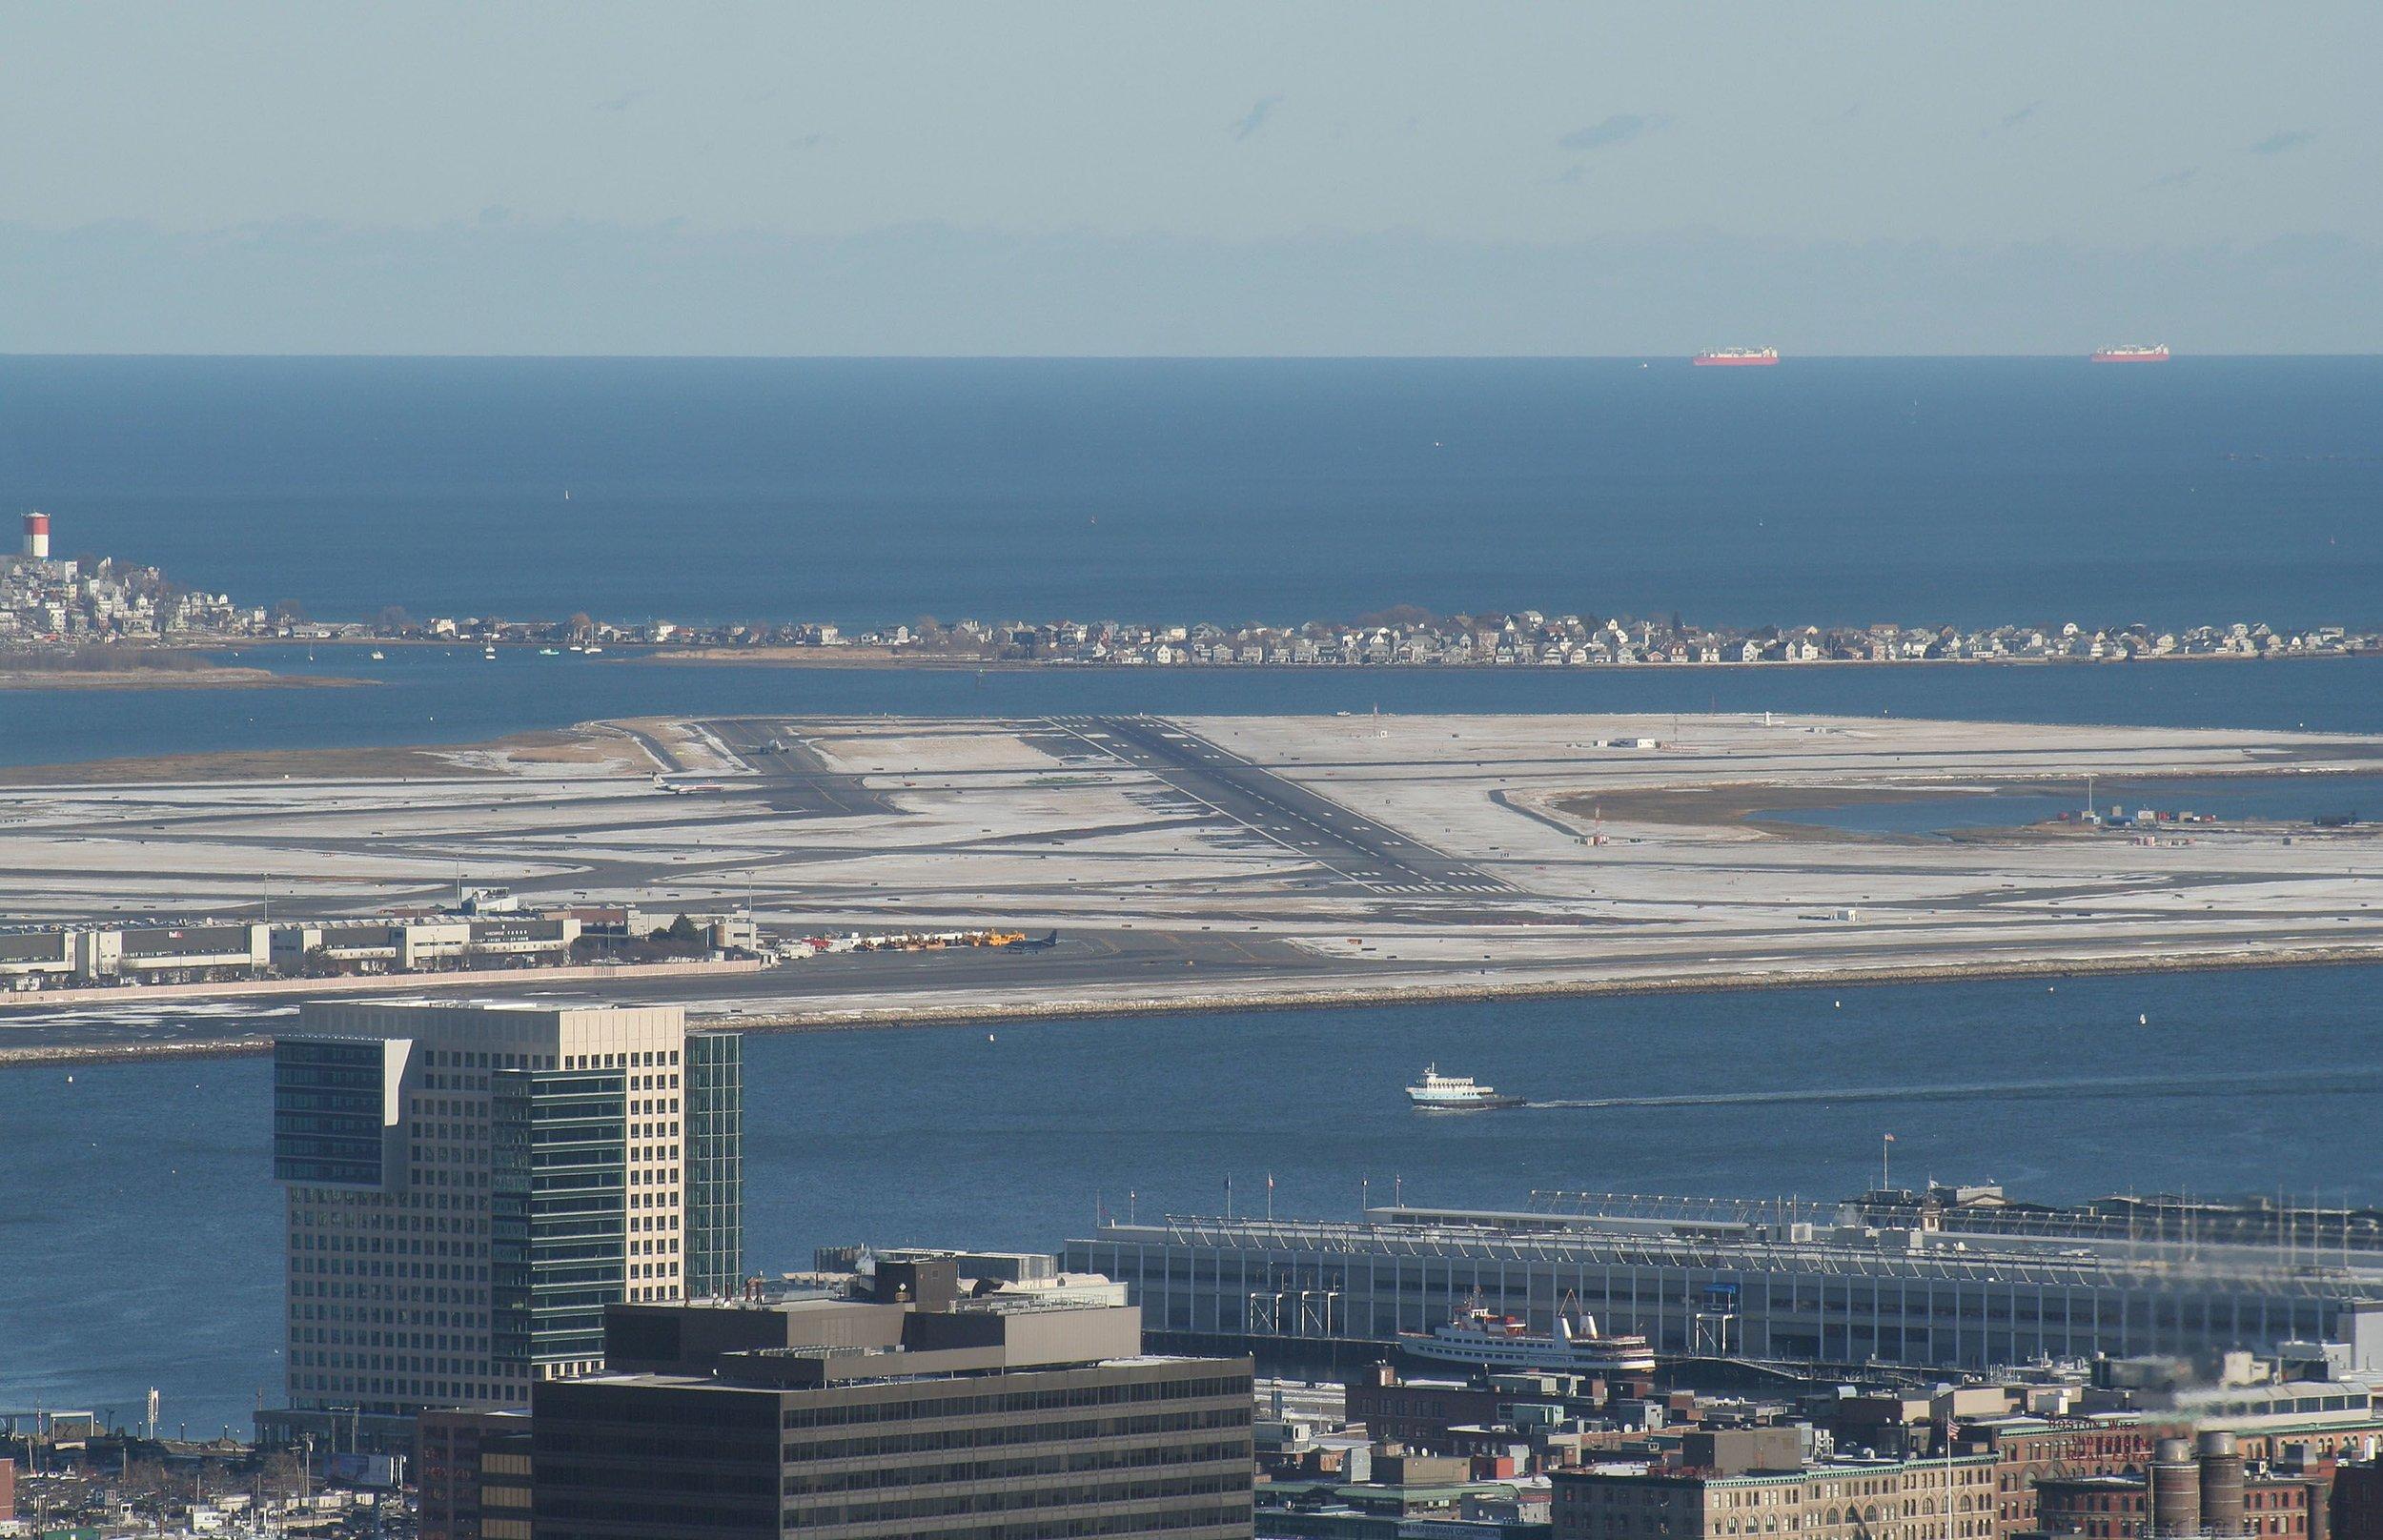 Boston_Logan_Airport,_runaways.JPG